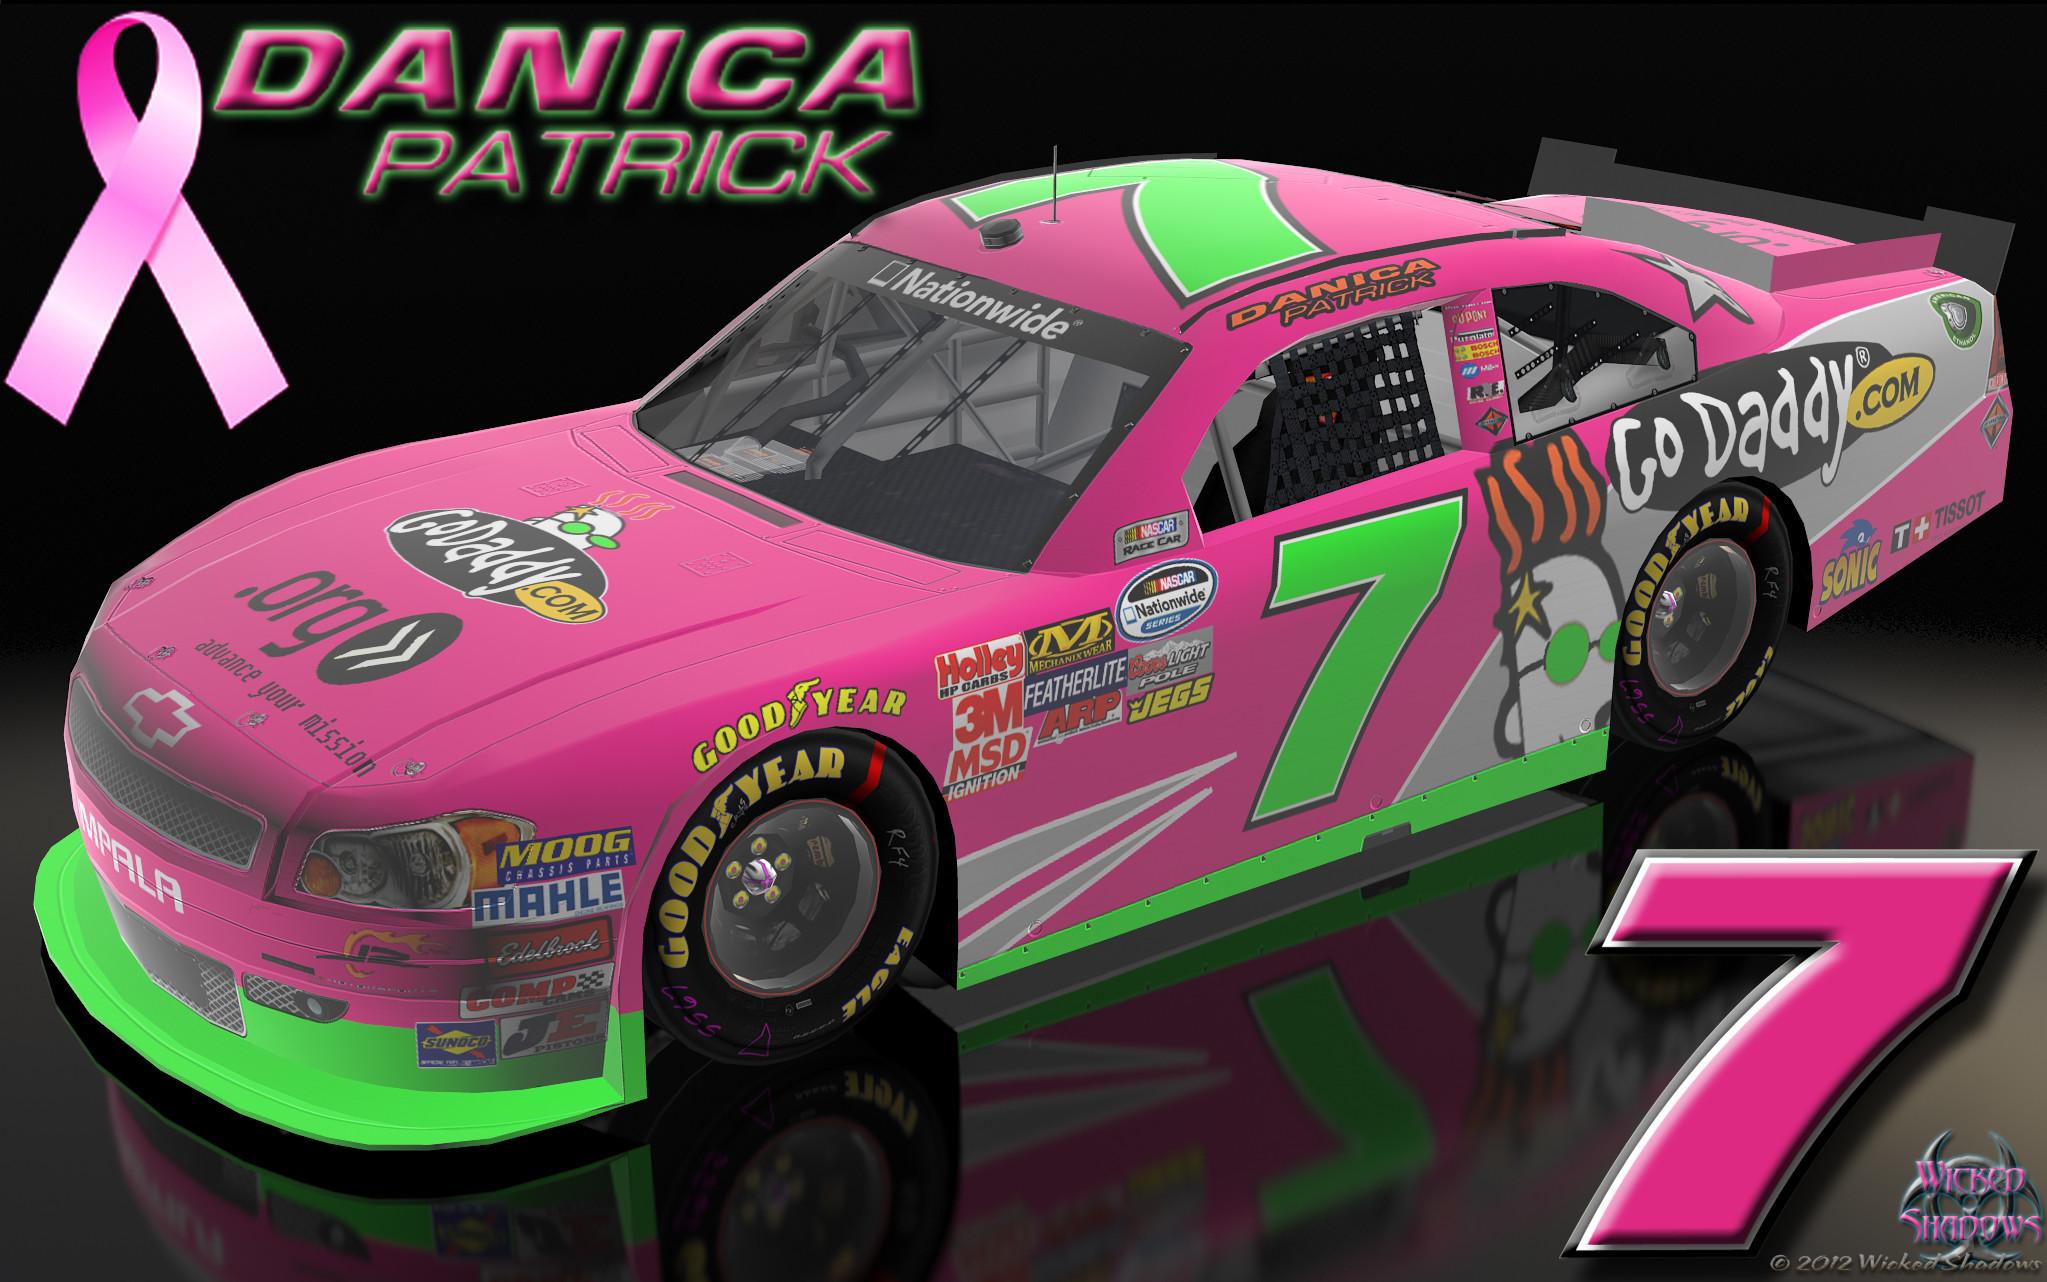 Danica Patrick Go Daddy Pink Car Breast Cancer Awareness Wallpaper